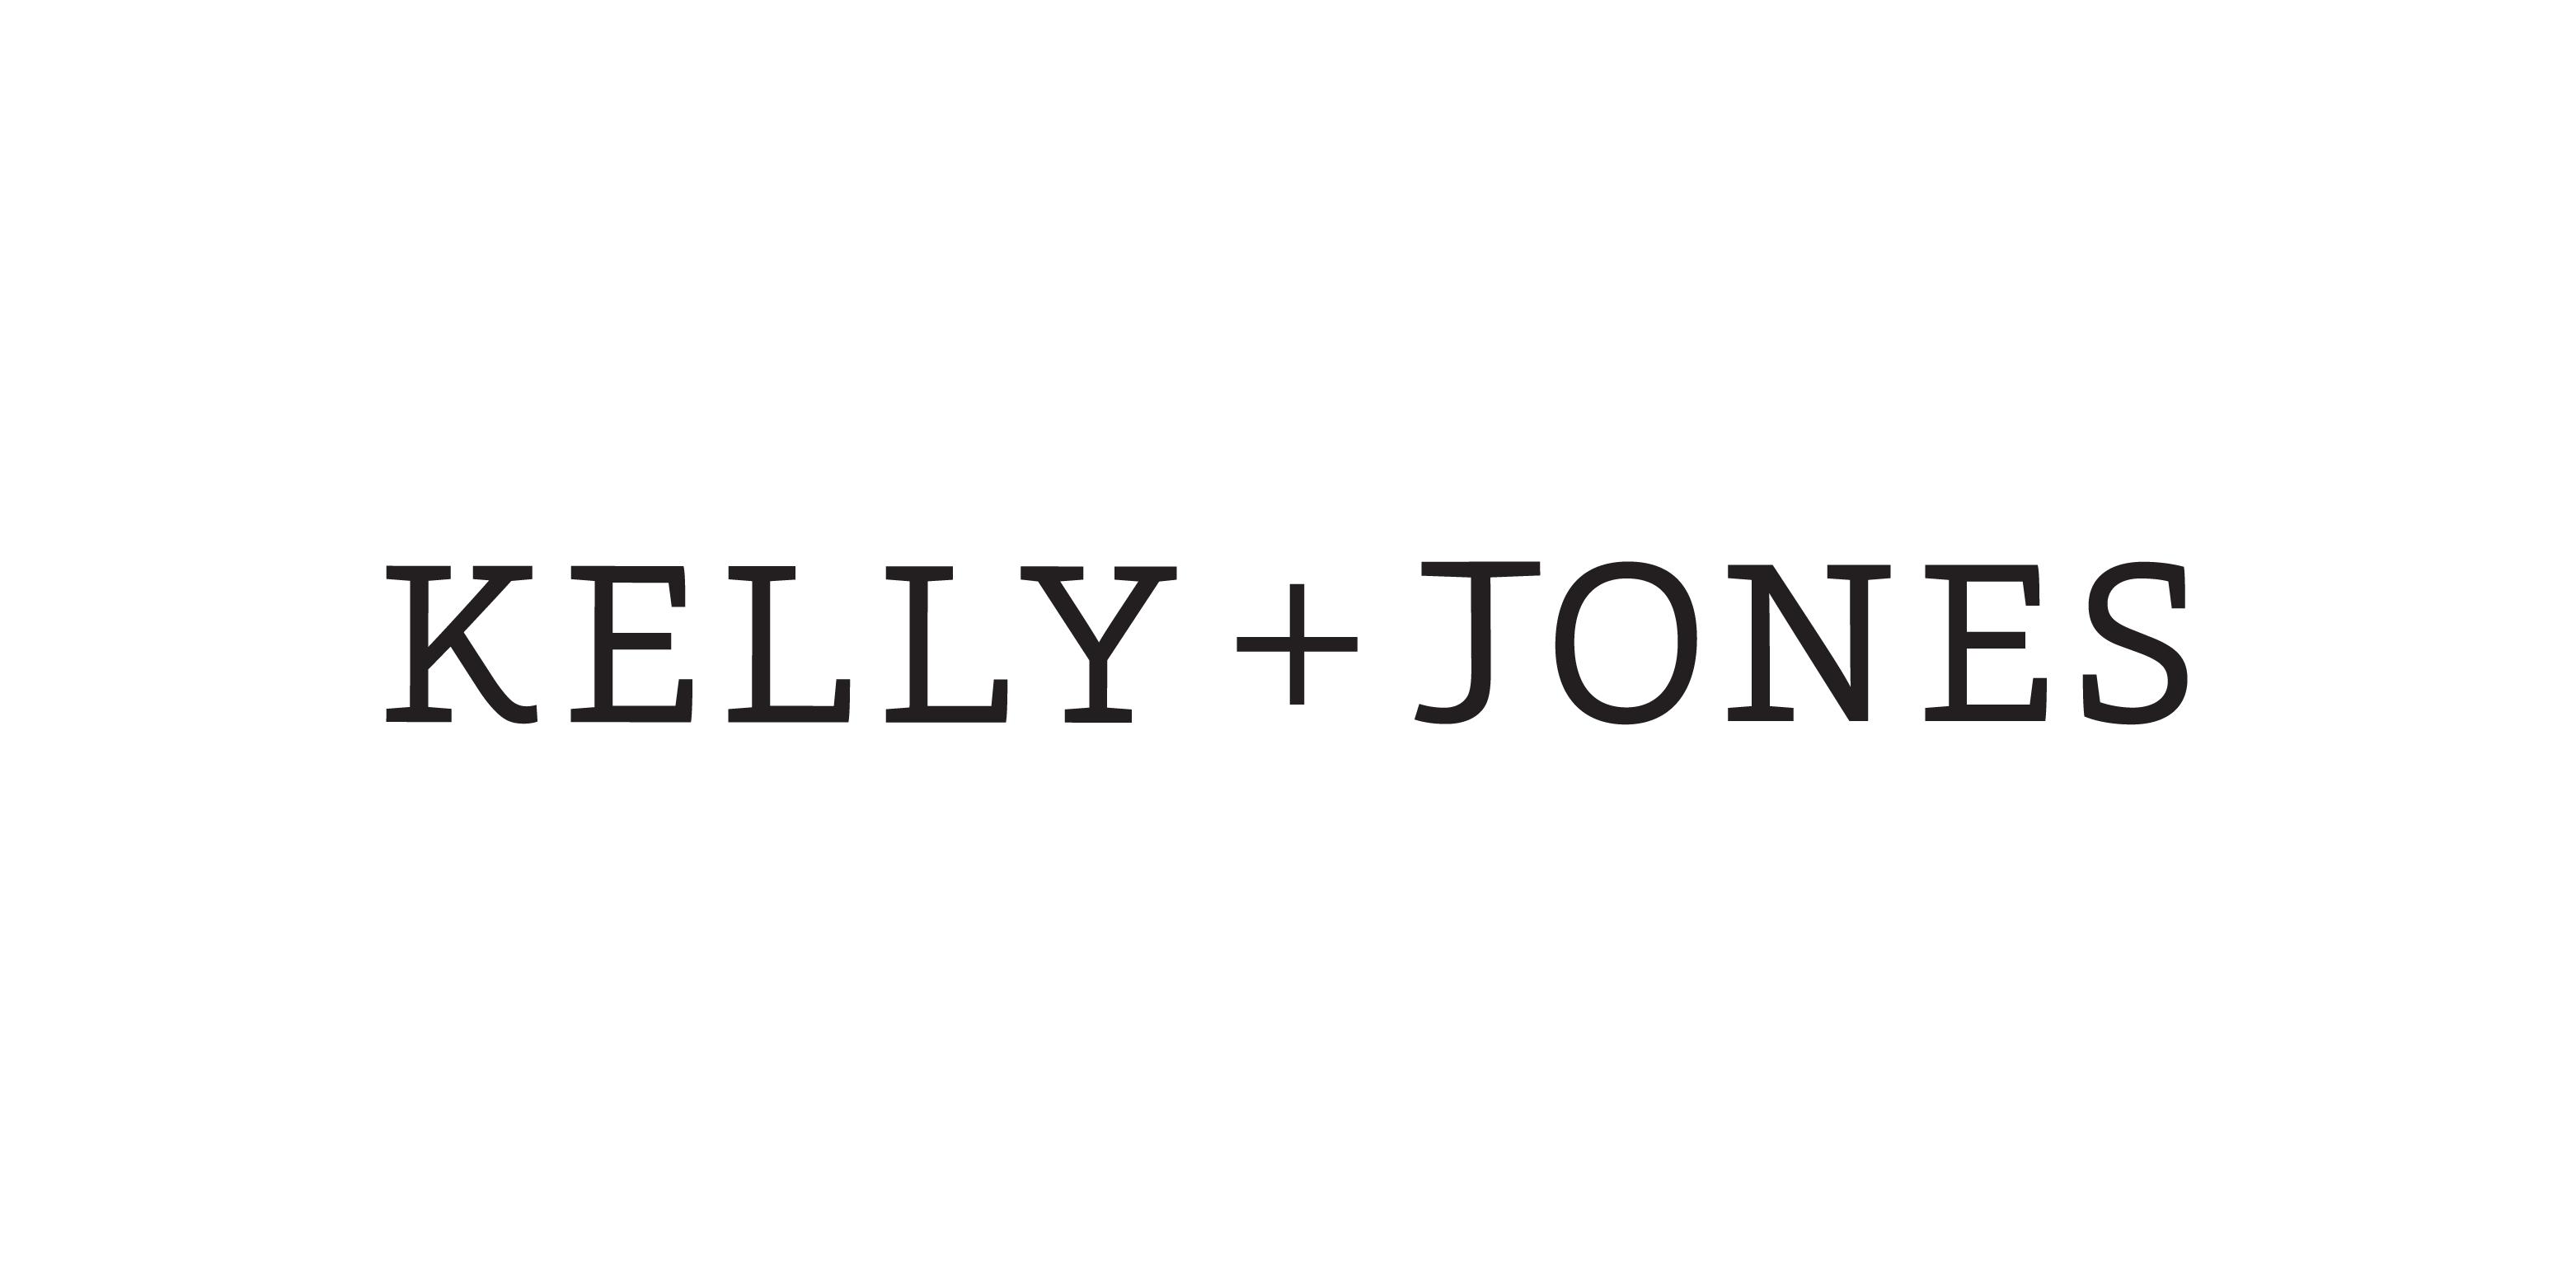 Kelly_Jones_Wordmark-01